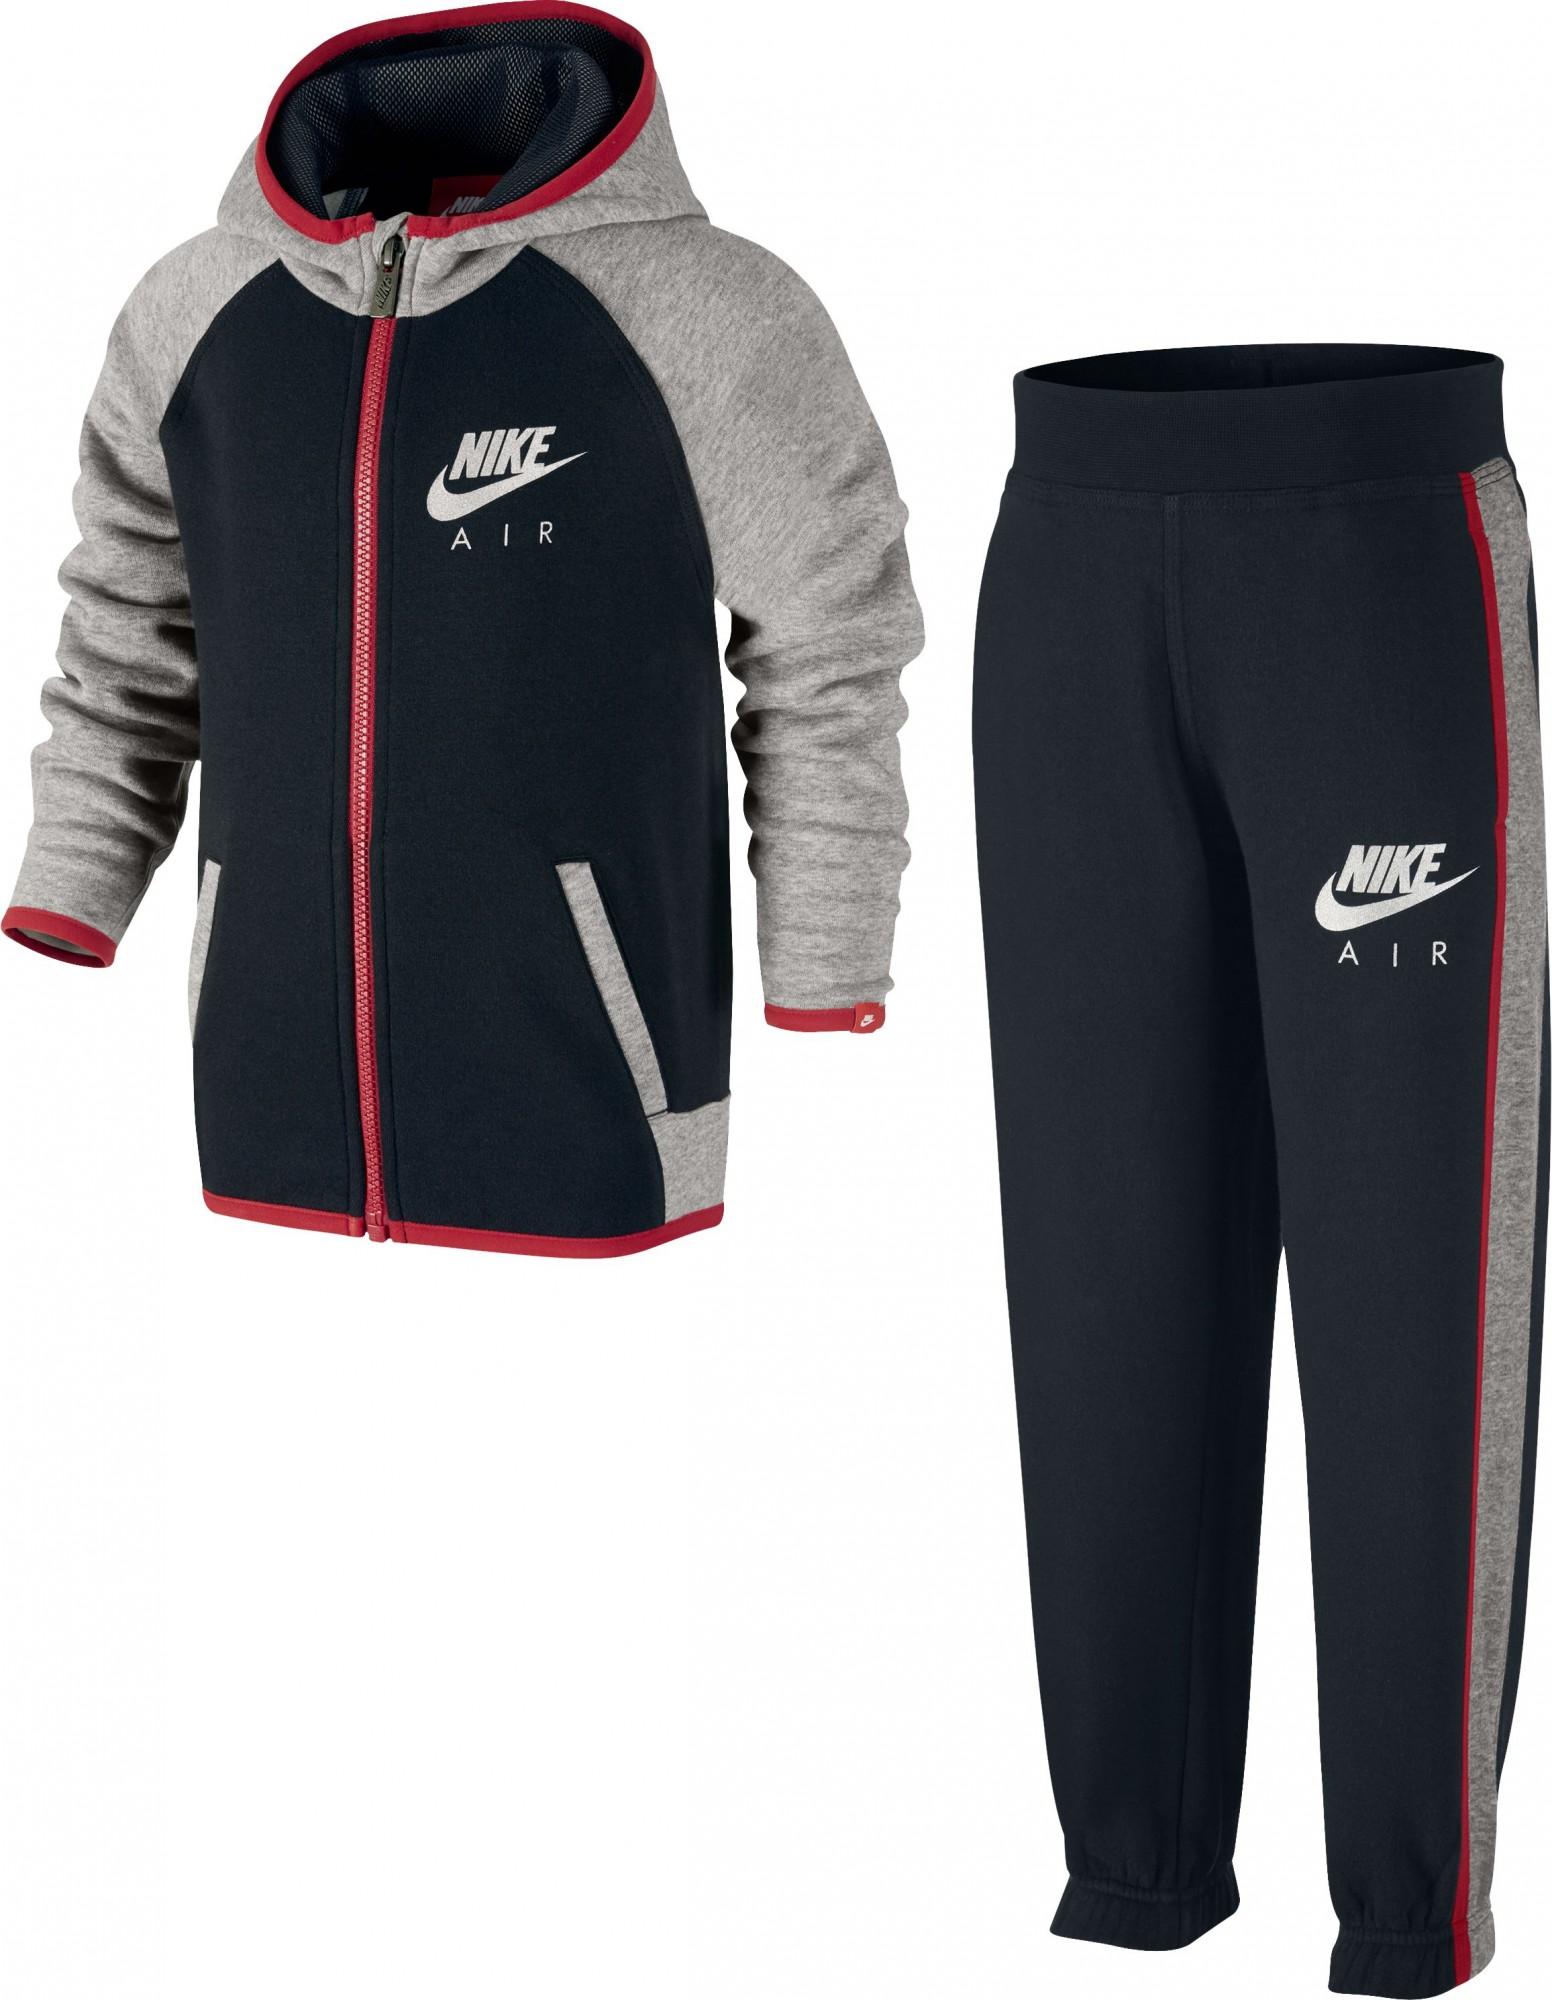 Chapka Nike Vetement Amp  D hiver Ensemble Survetement Pull Doudoune gaTPwU a4fa509acf8a